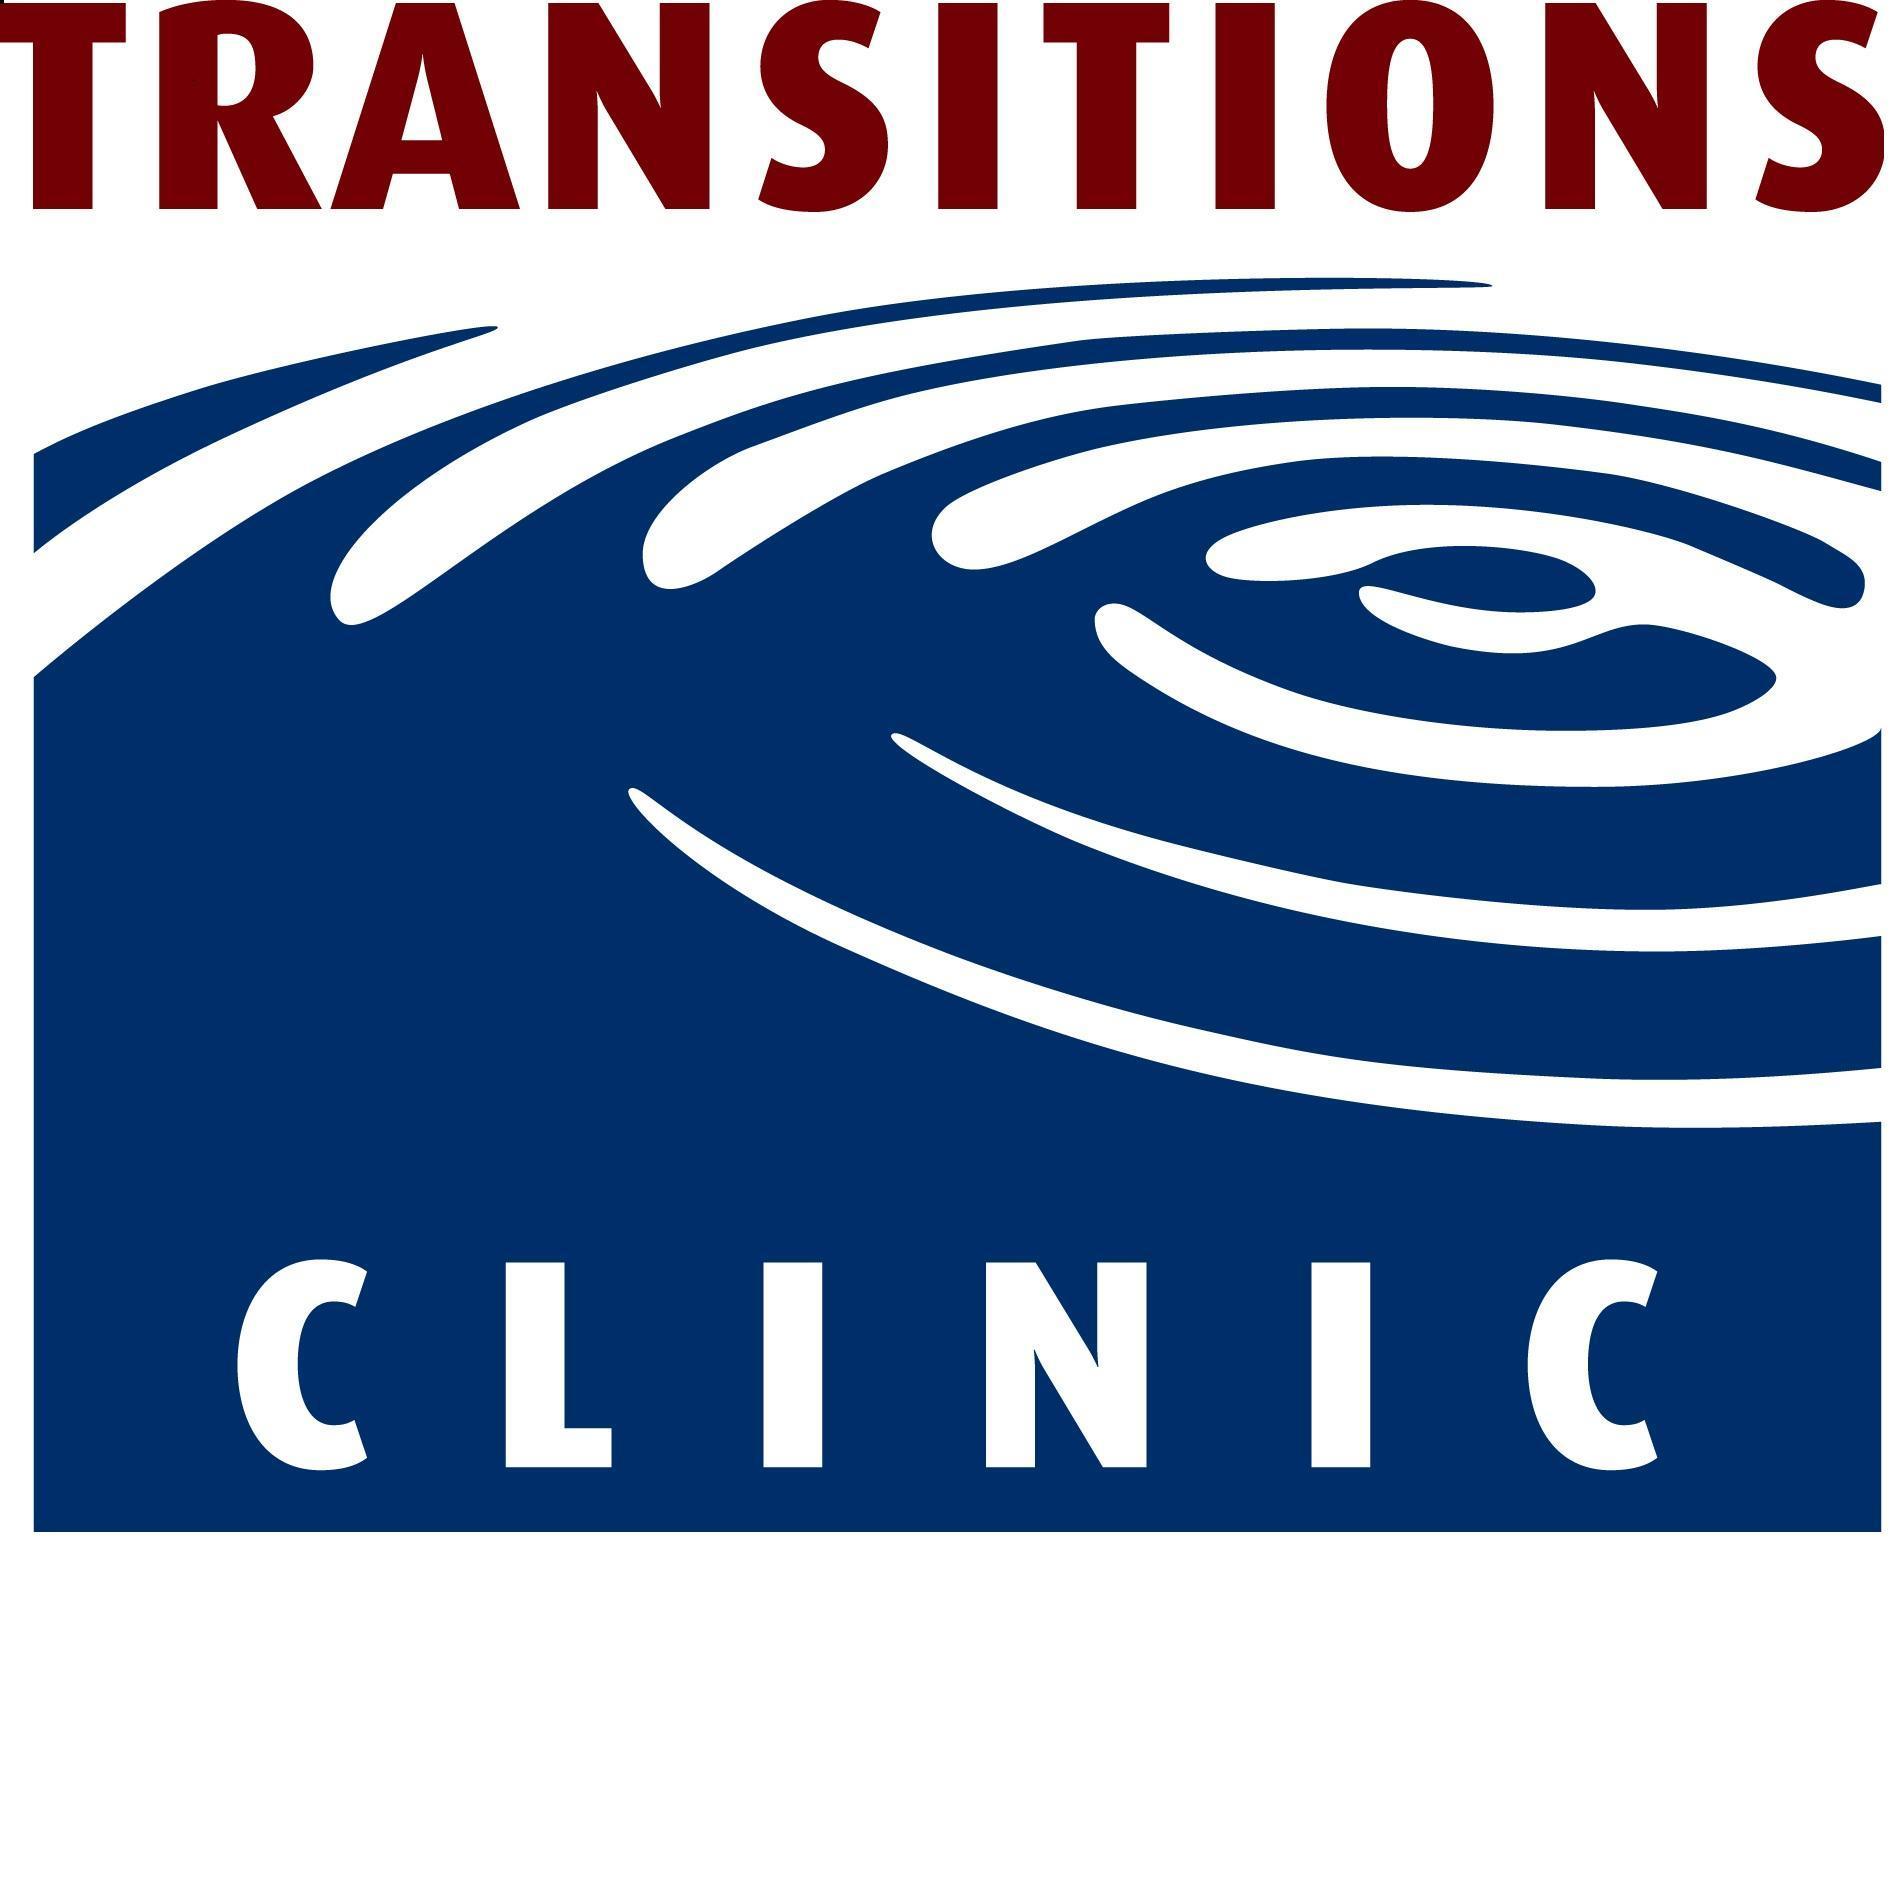 Transitions Clinic logo.jpeg